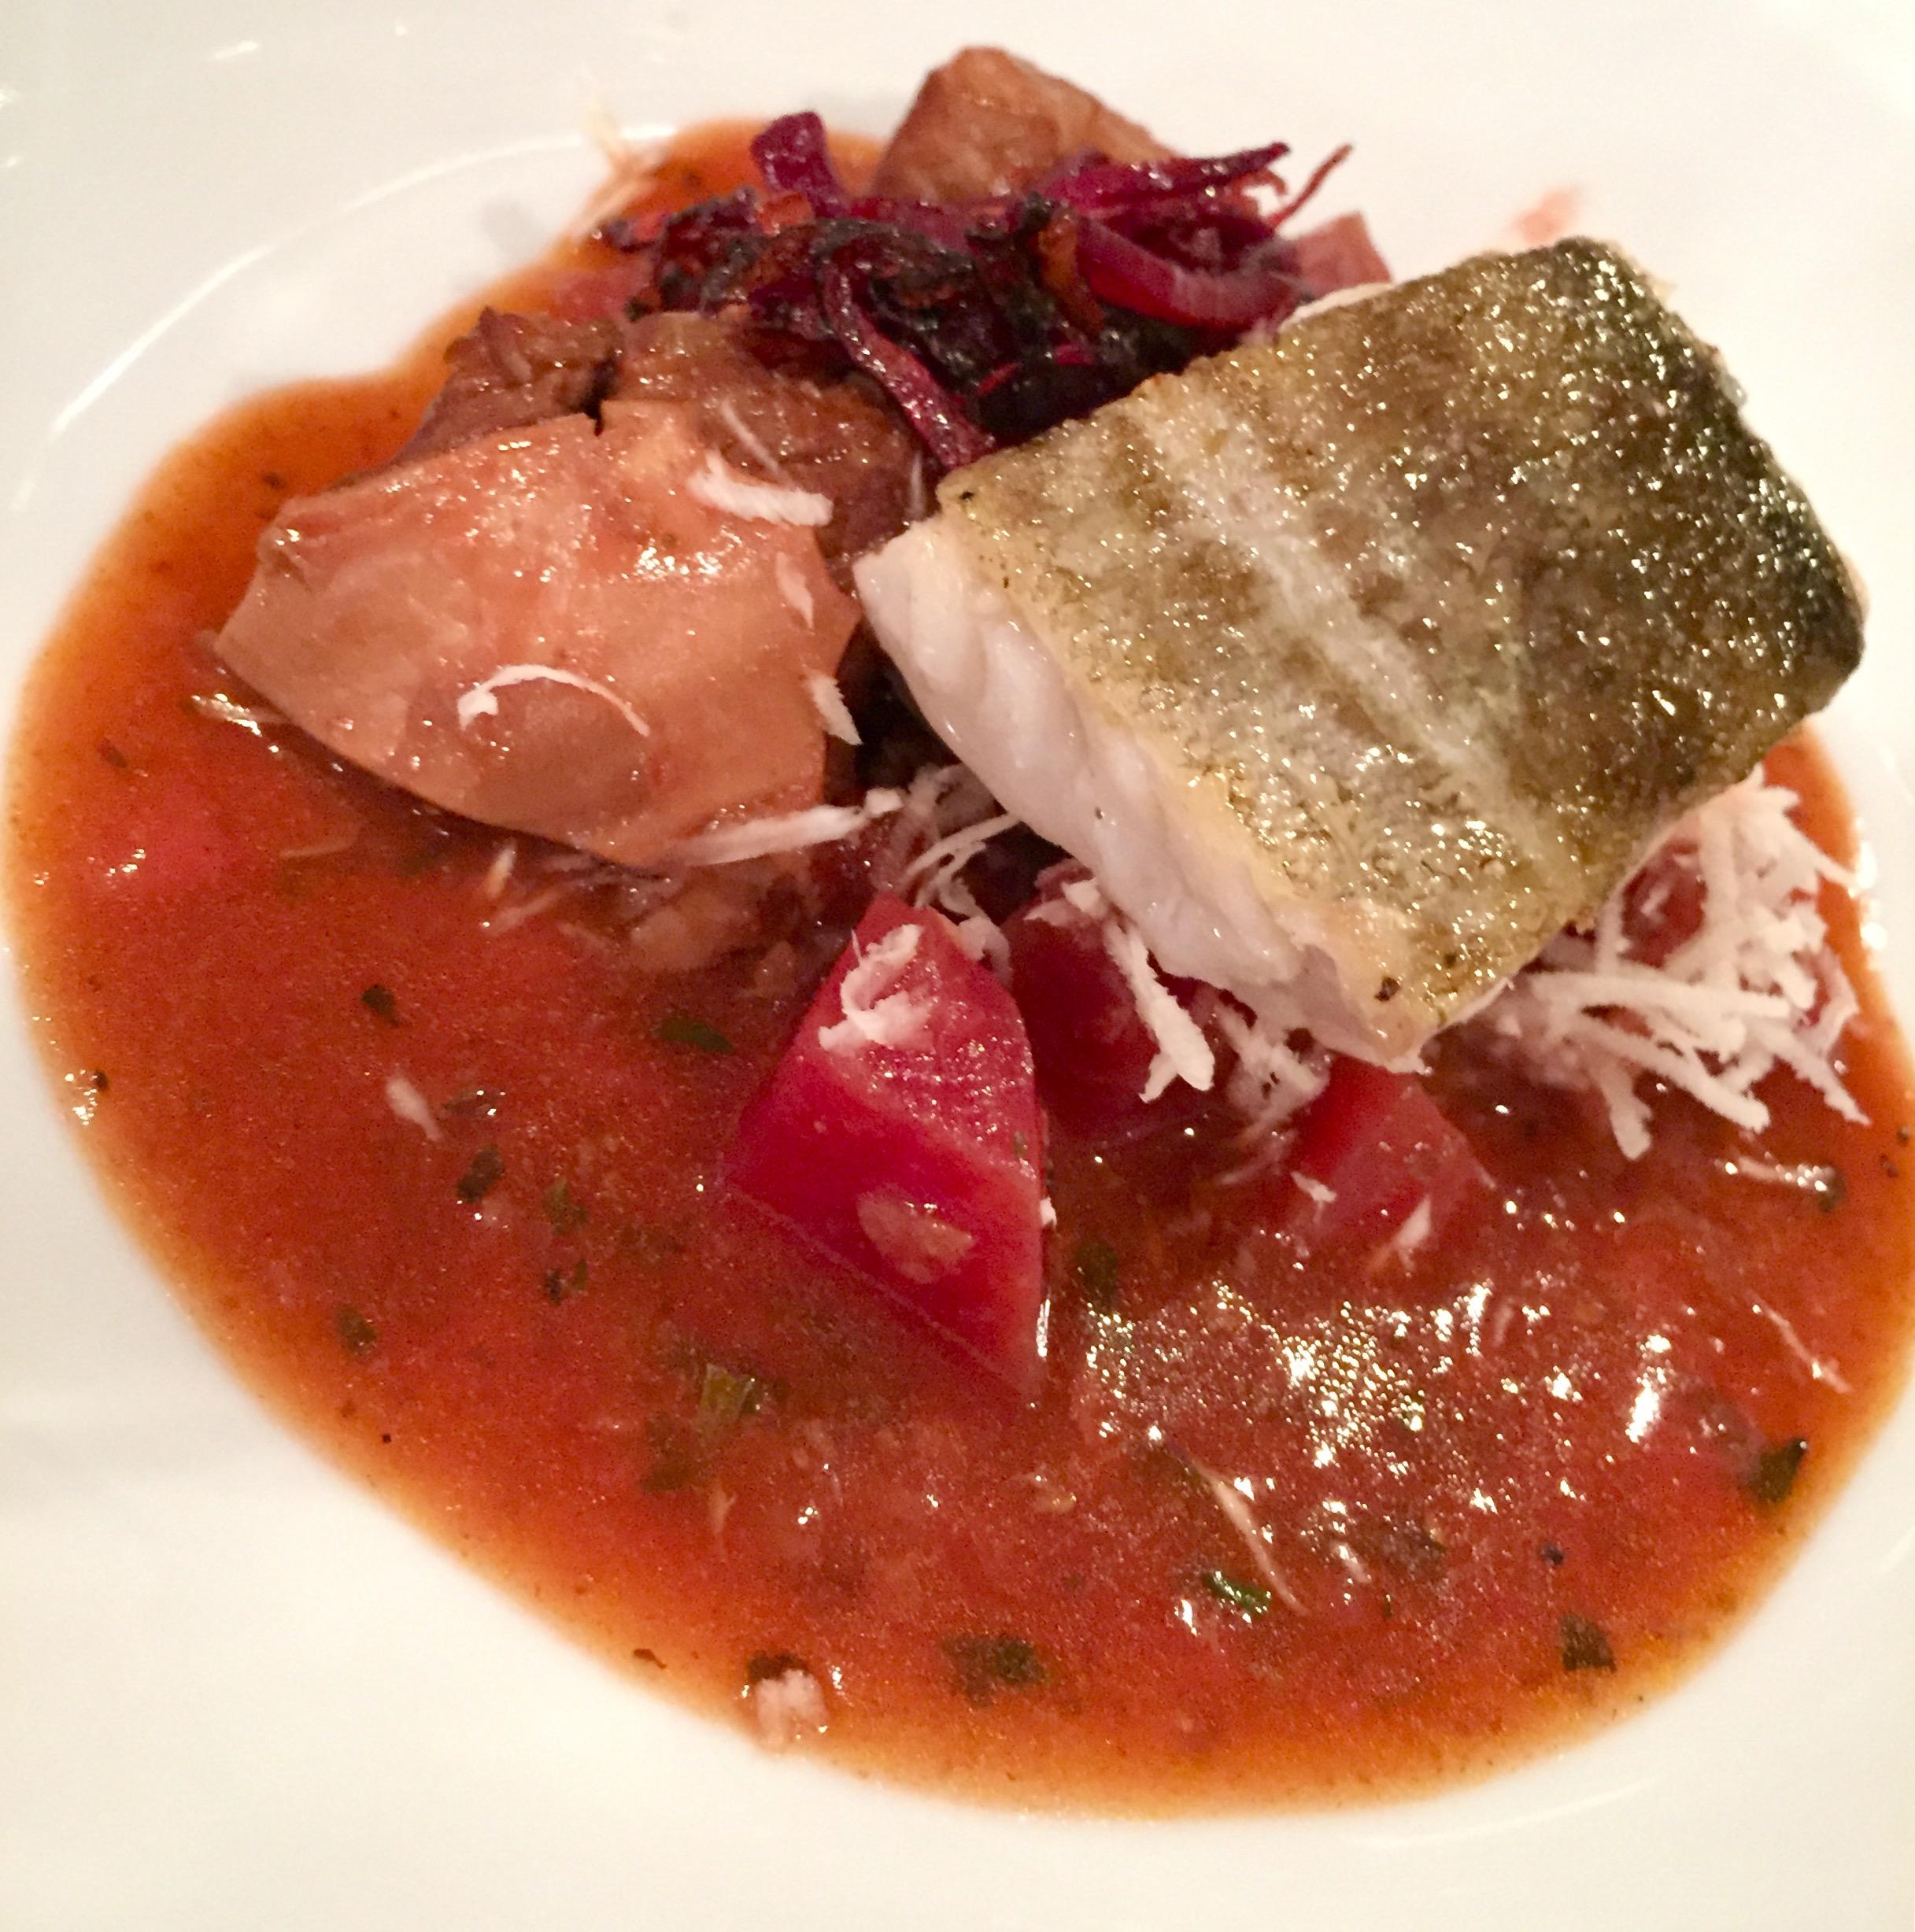 Surf n' turf - short rib, beetroot, horseradish, cod, orange and ginger